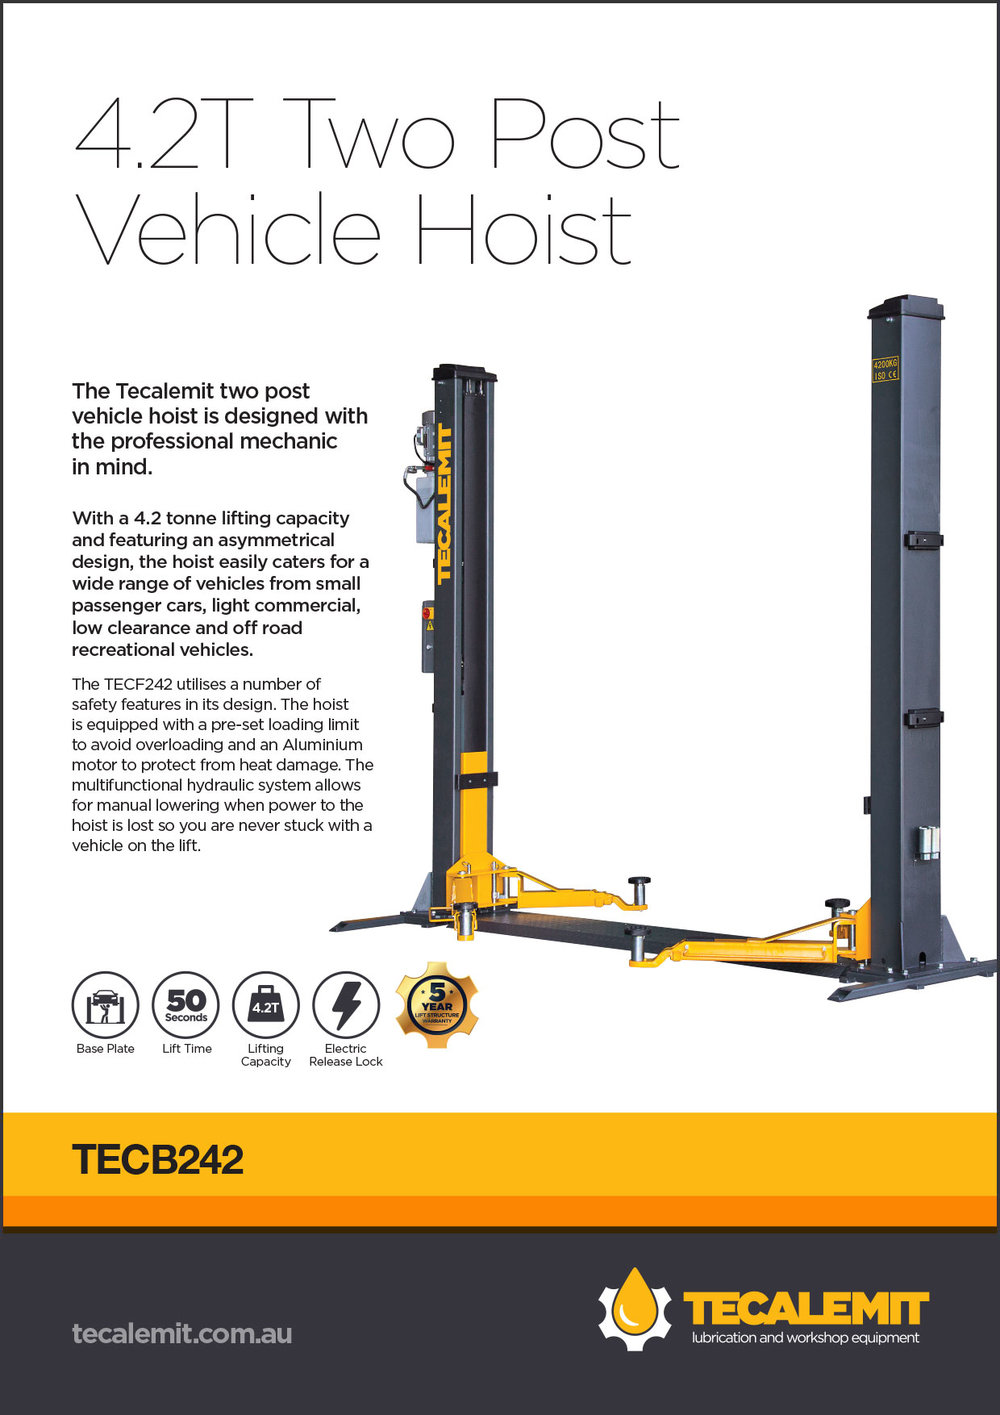 TECB242 Product Info